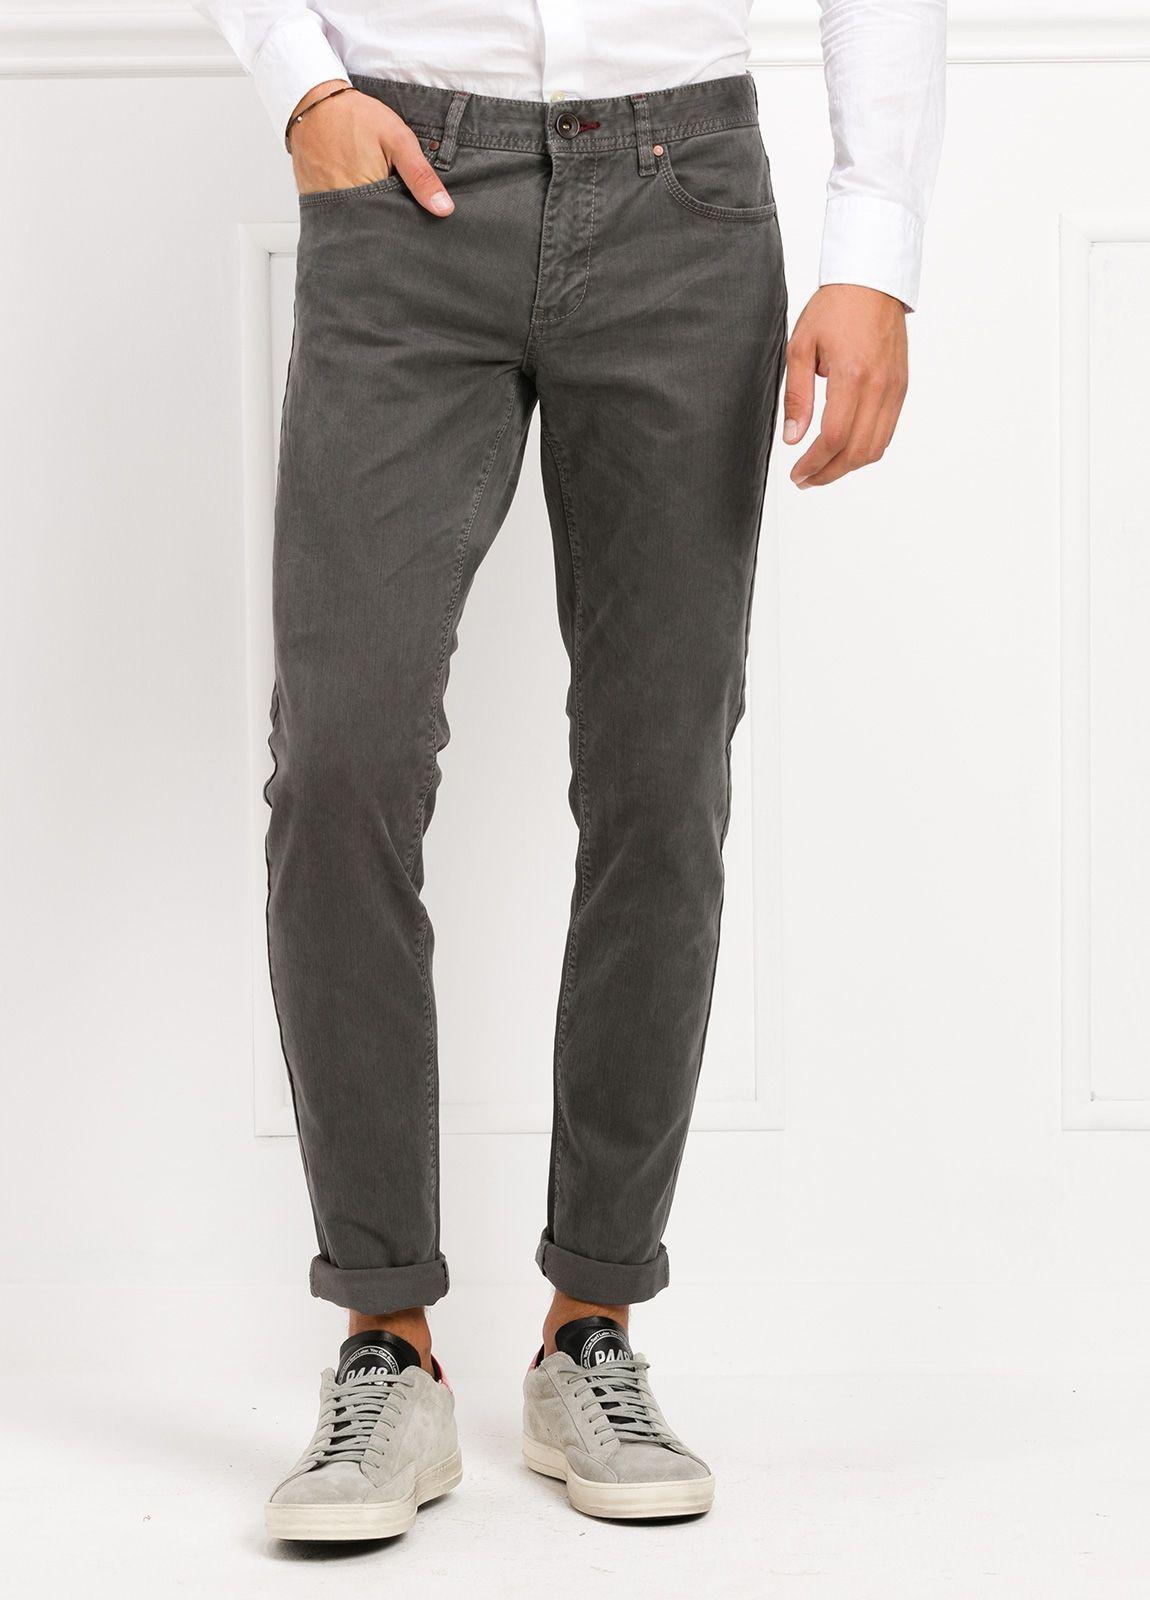 Pantalón 5 bolsillos SLIM FIT modelo FRED 75 color gris oscuro. 97 ... 41ad1cd0fa24